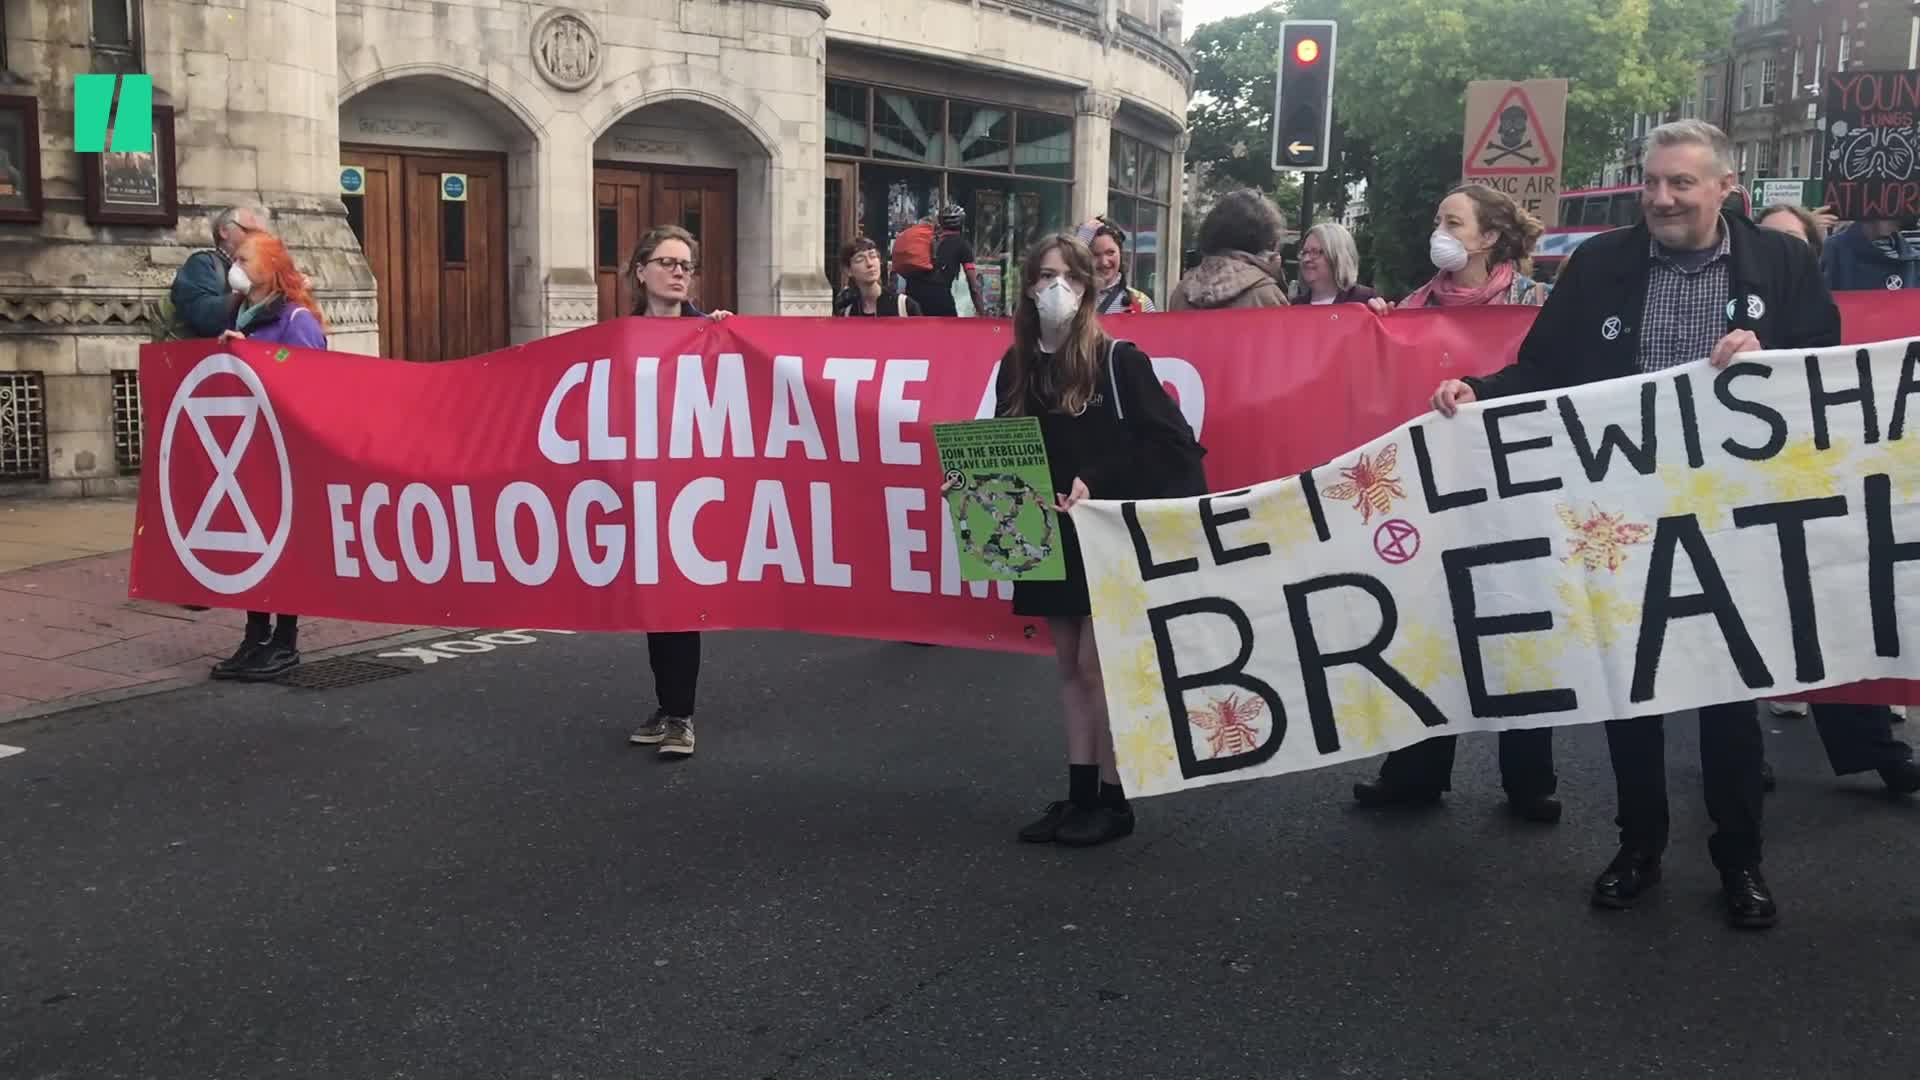 Extinction Rebellion: Met Police Warn Activists Against Heathrow Airport Drone Protest